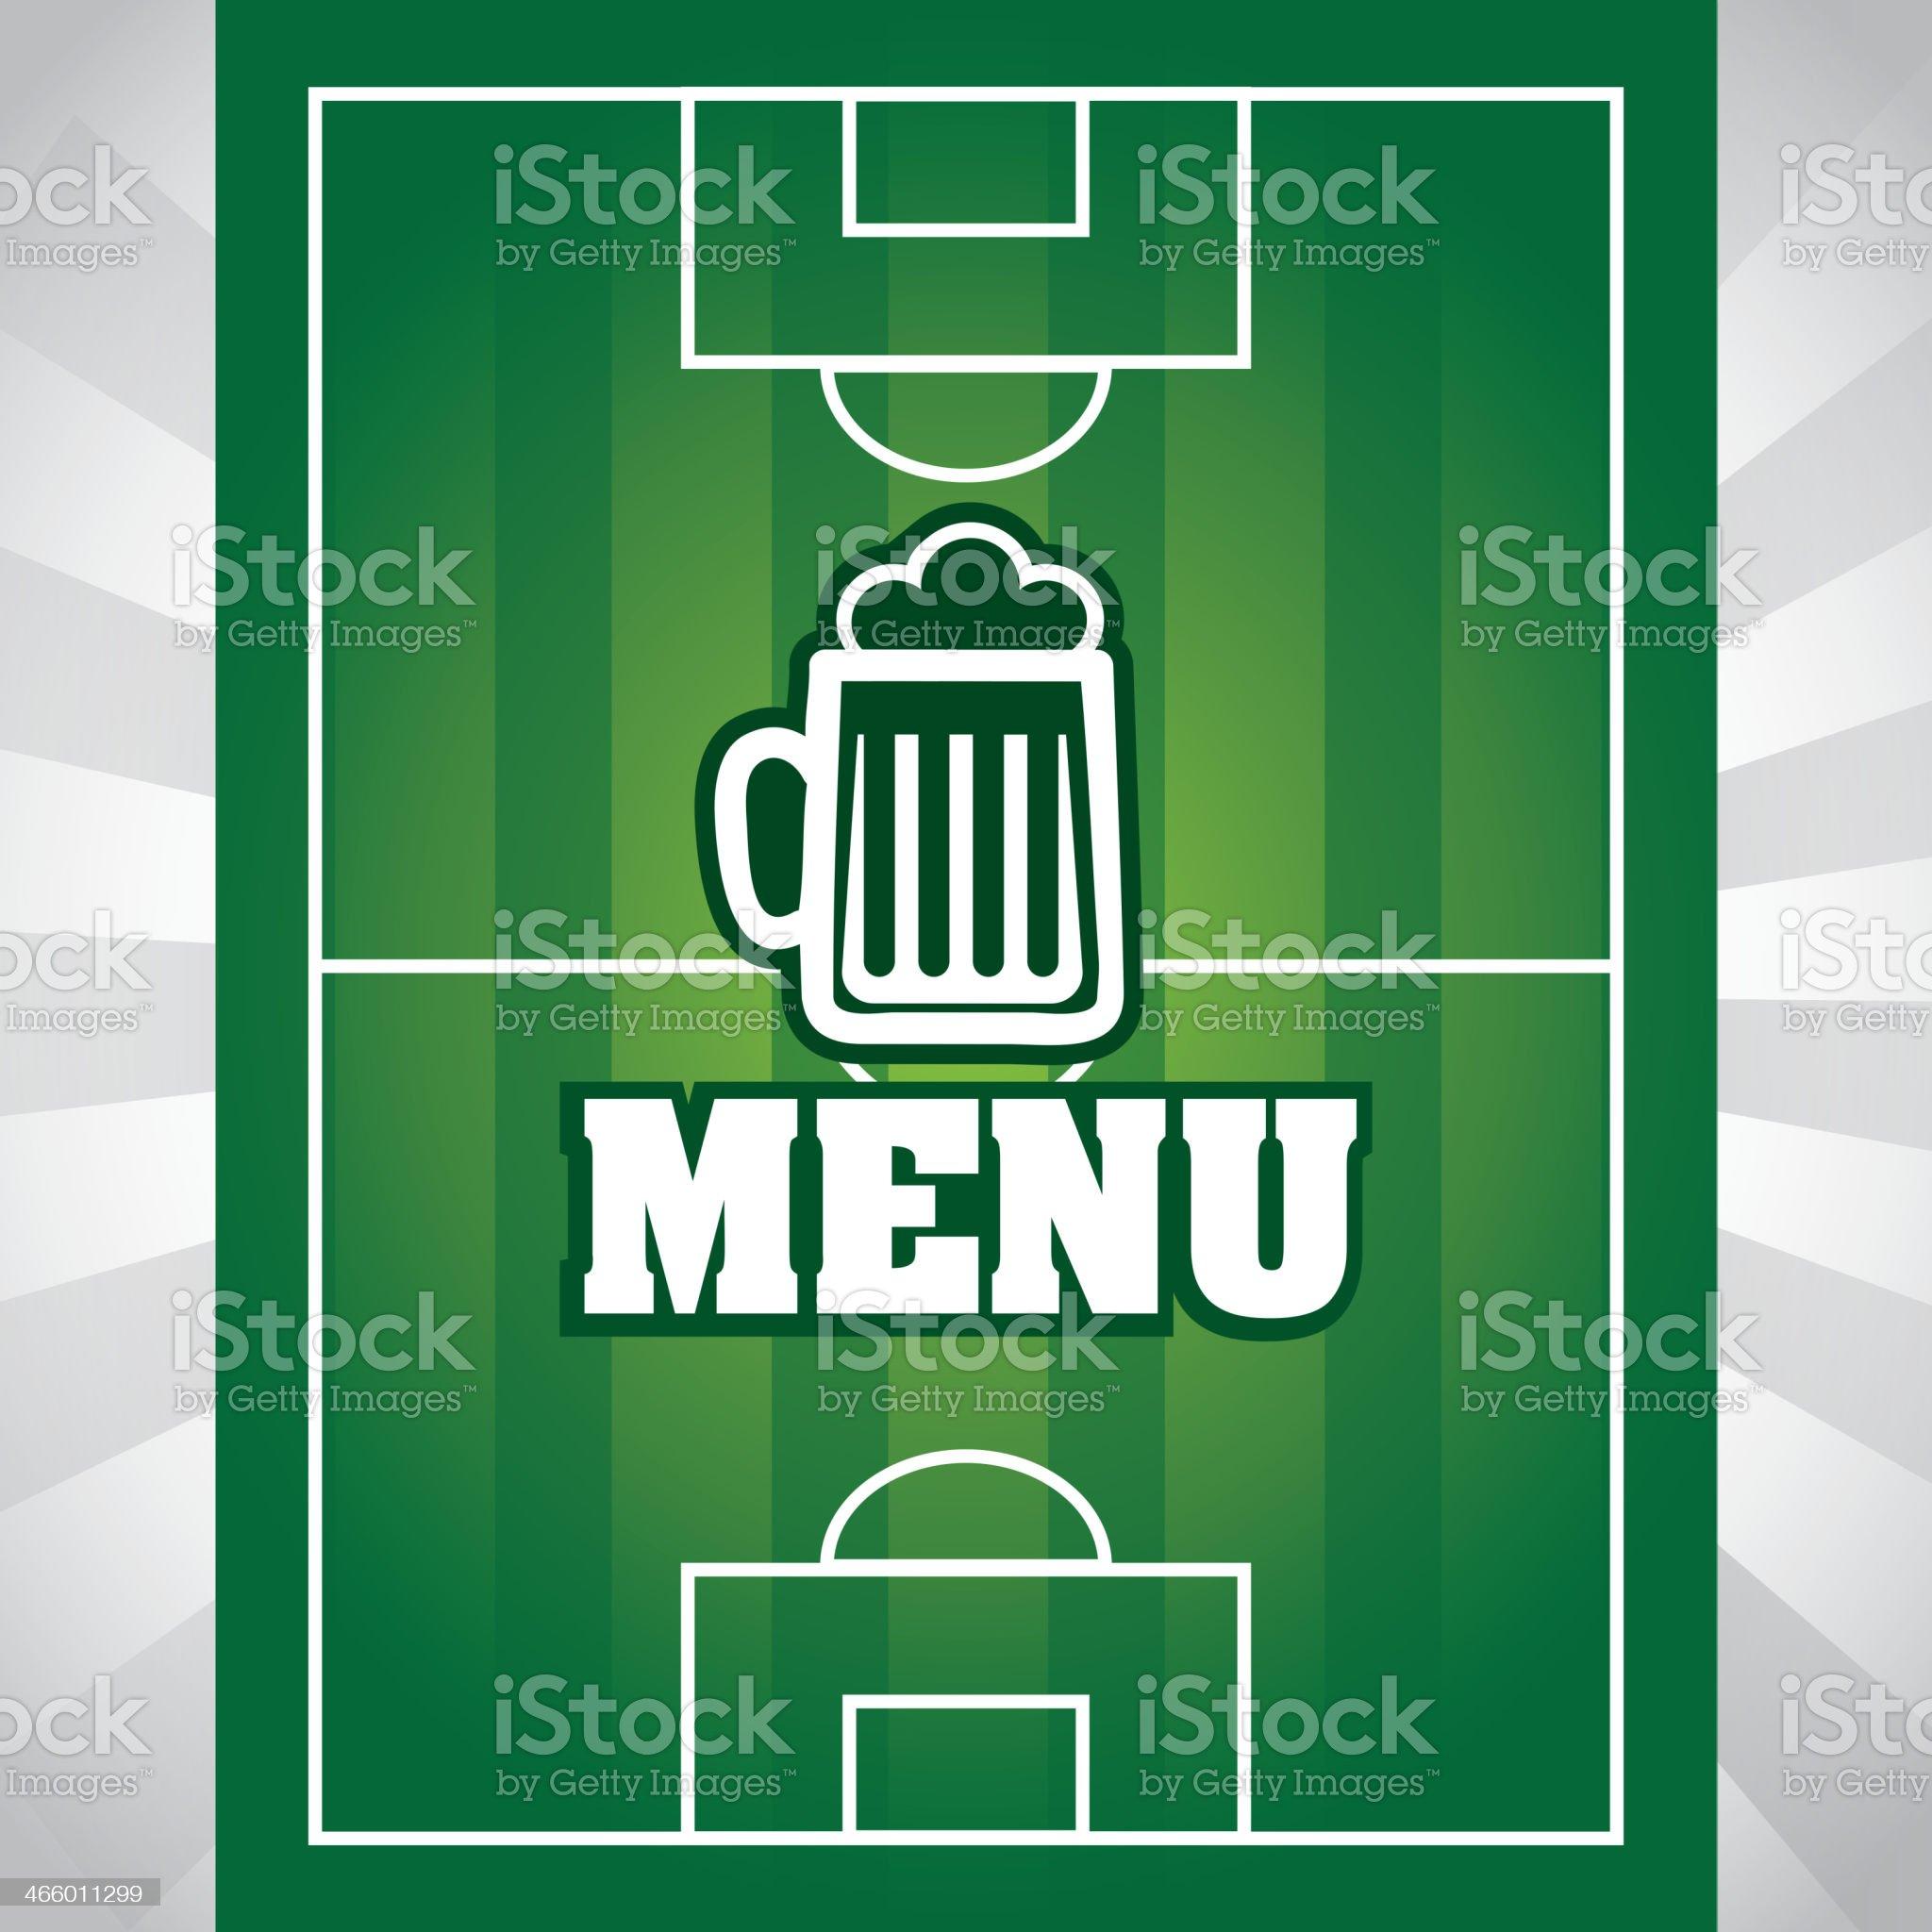 Soccer Design royalty-free stock vector art